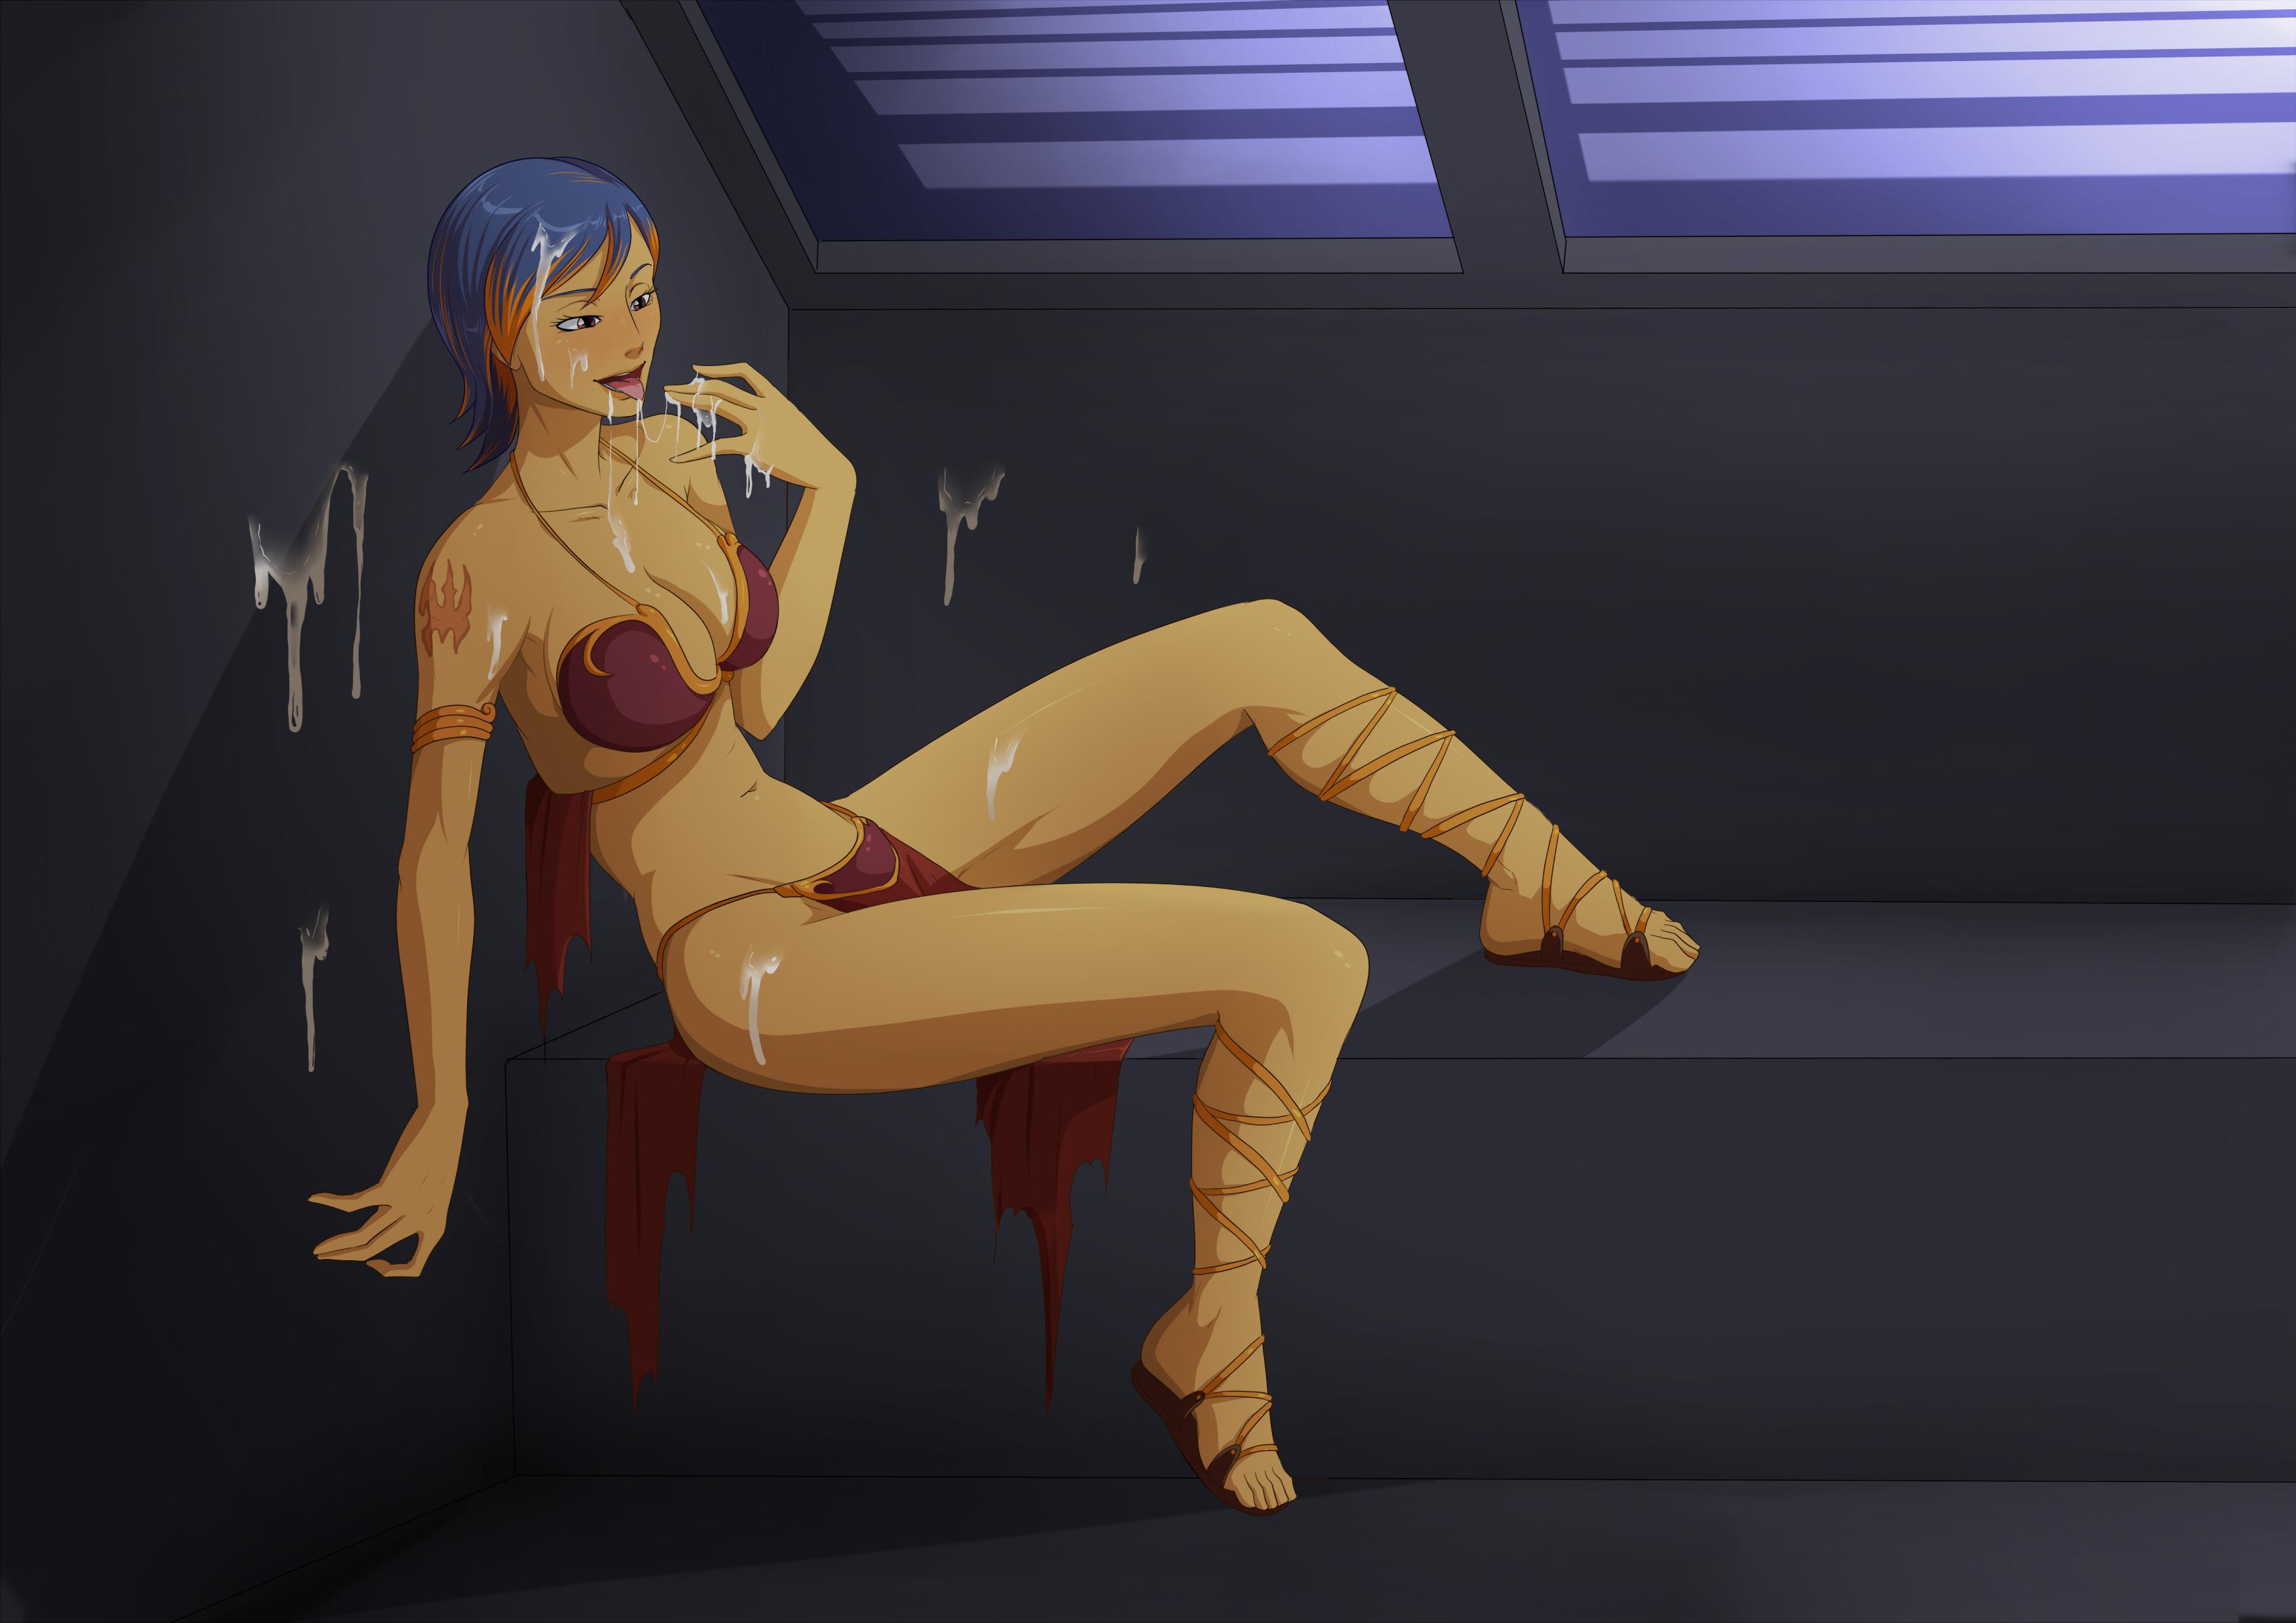 View star wars rebels - Hentai Porn free